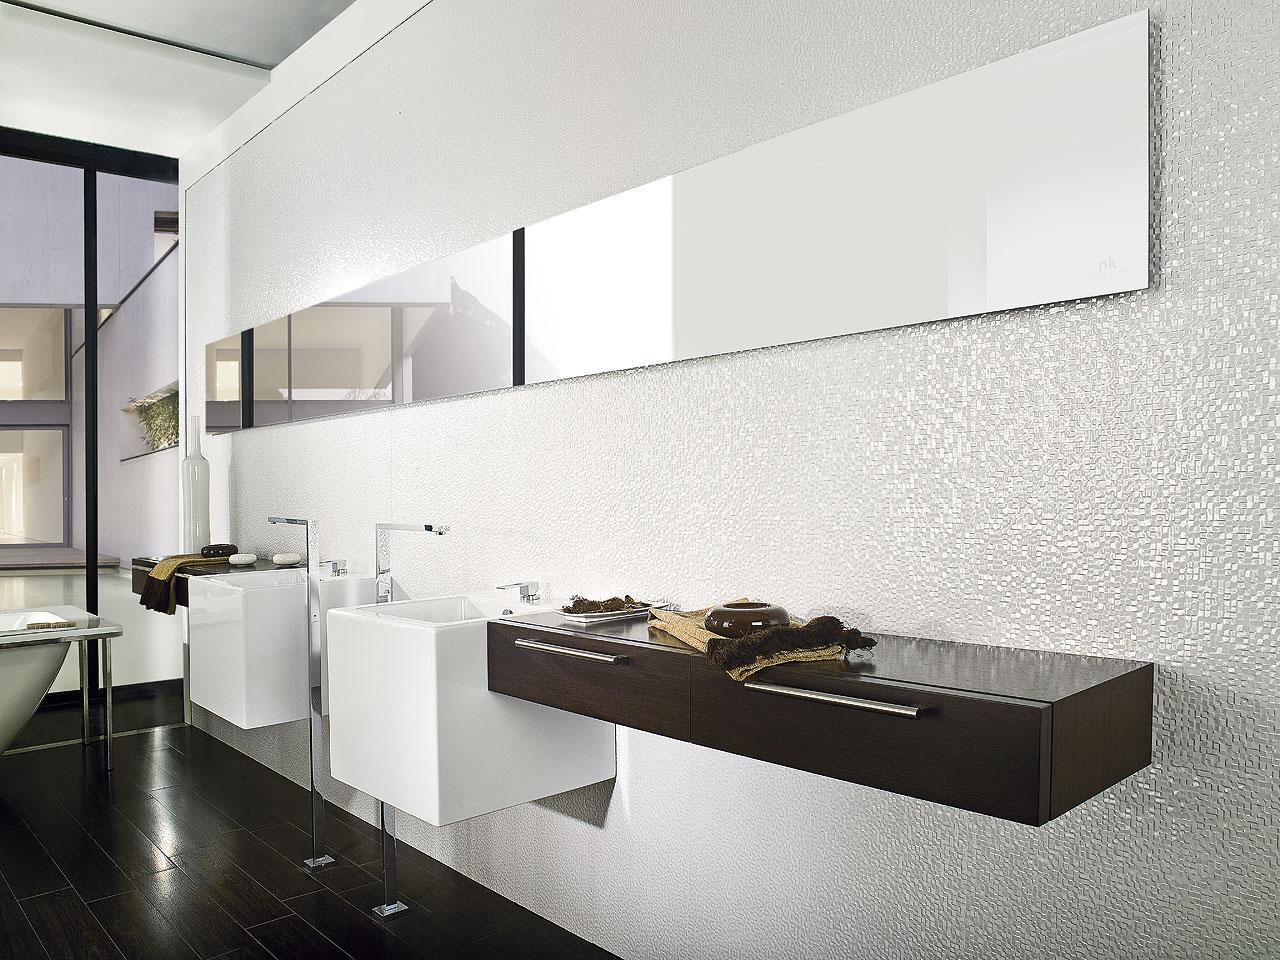 Cubica Blanco wall tile 20x33.3 - Tiles 2 Go Ltd